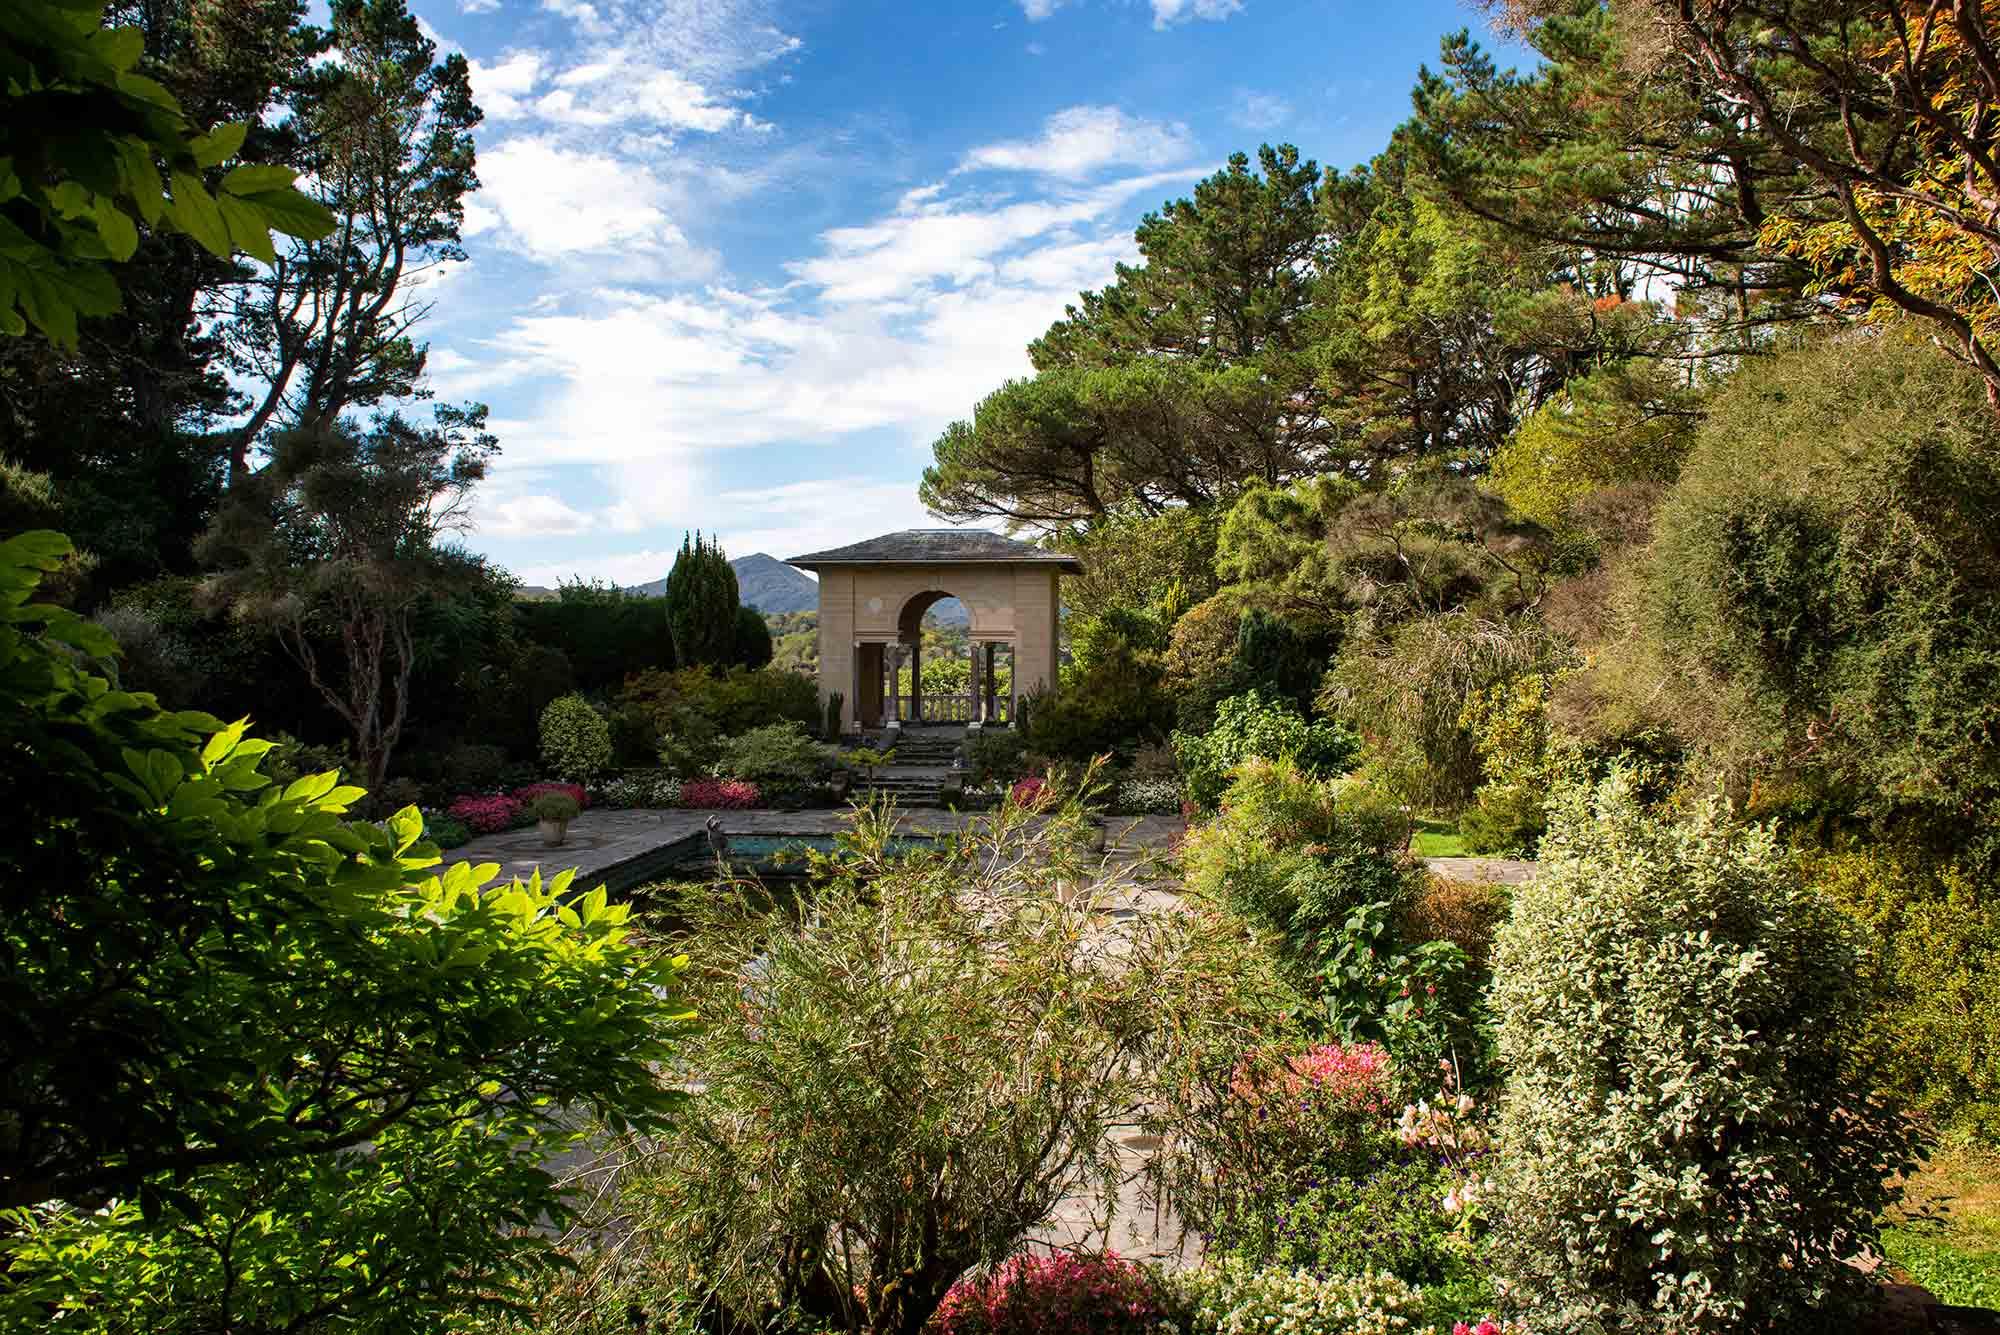 Inside the Italian garden